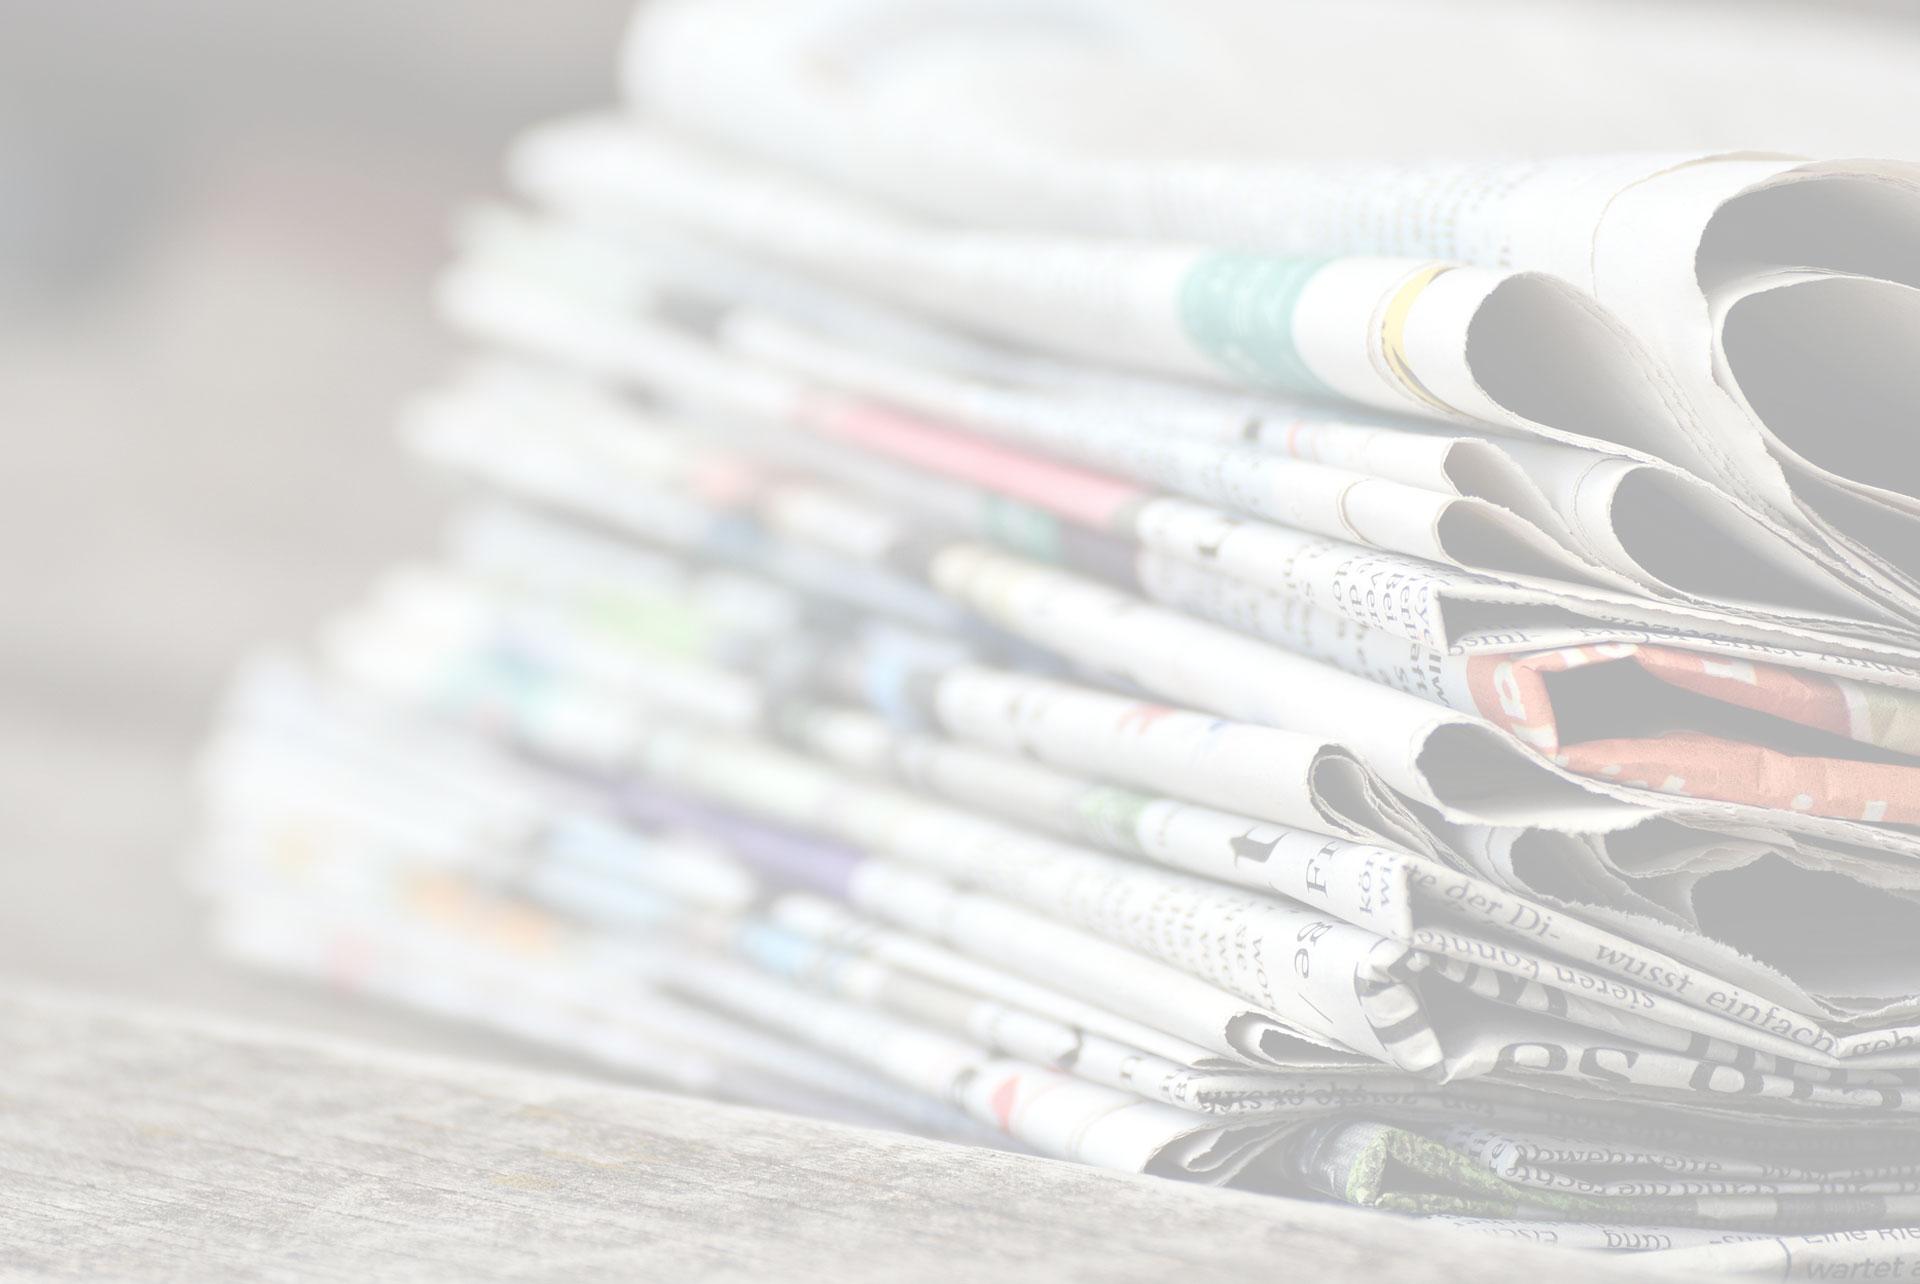 Facebook come disattivare account